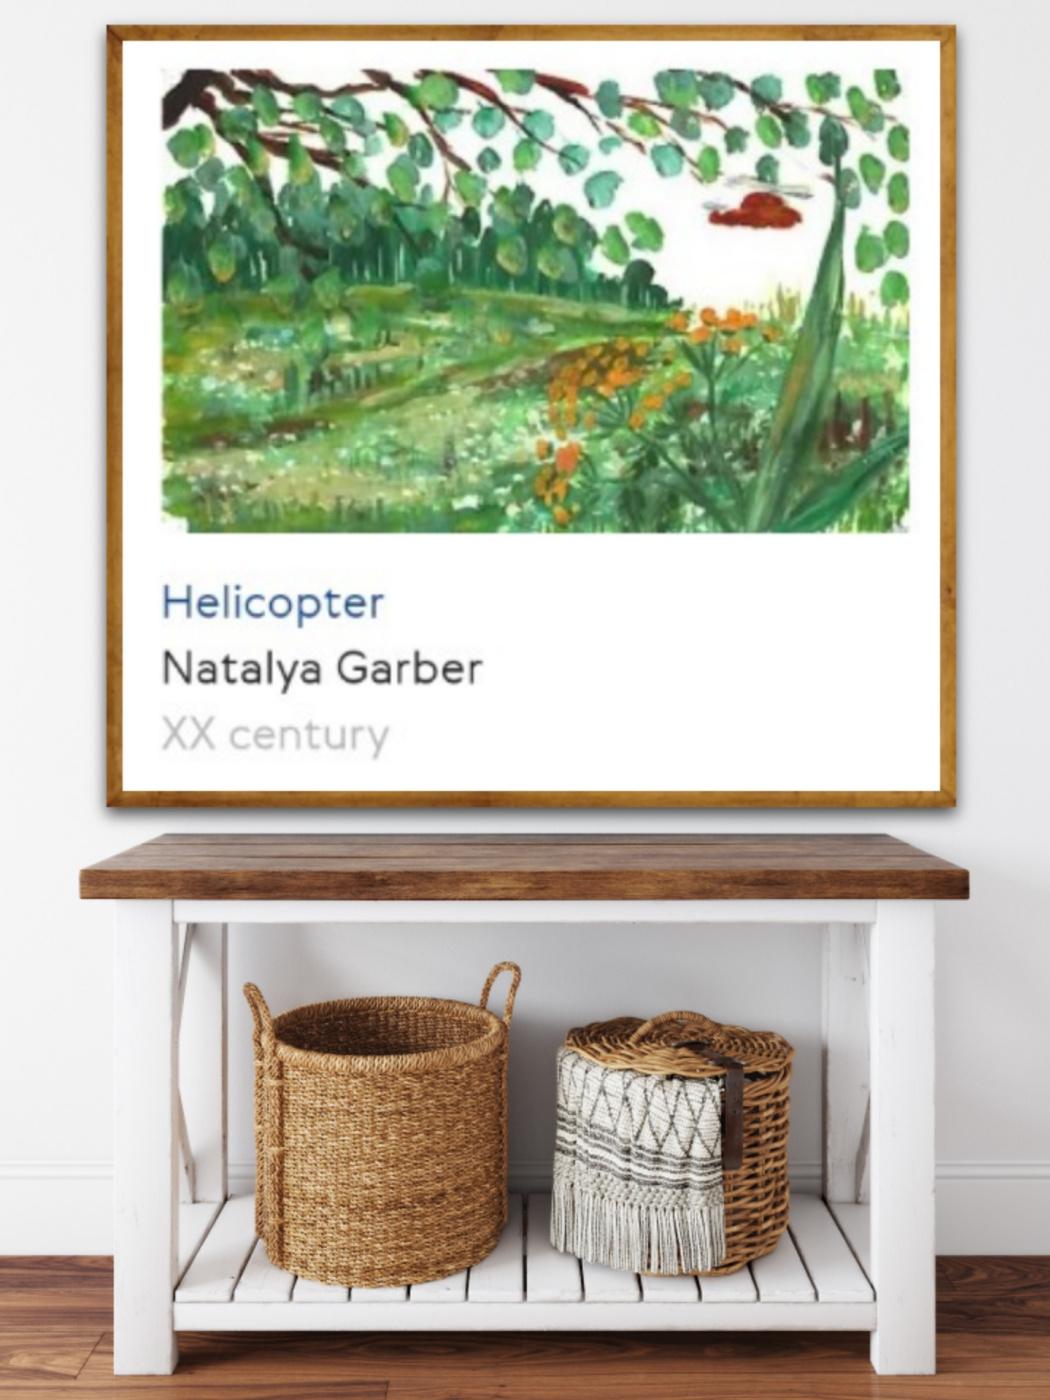 Natalya Garber. Helicopter. Hallway work